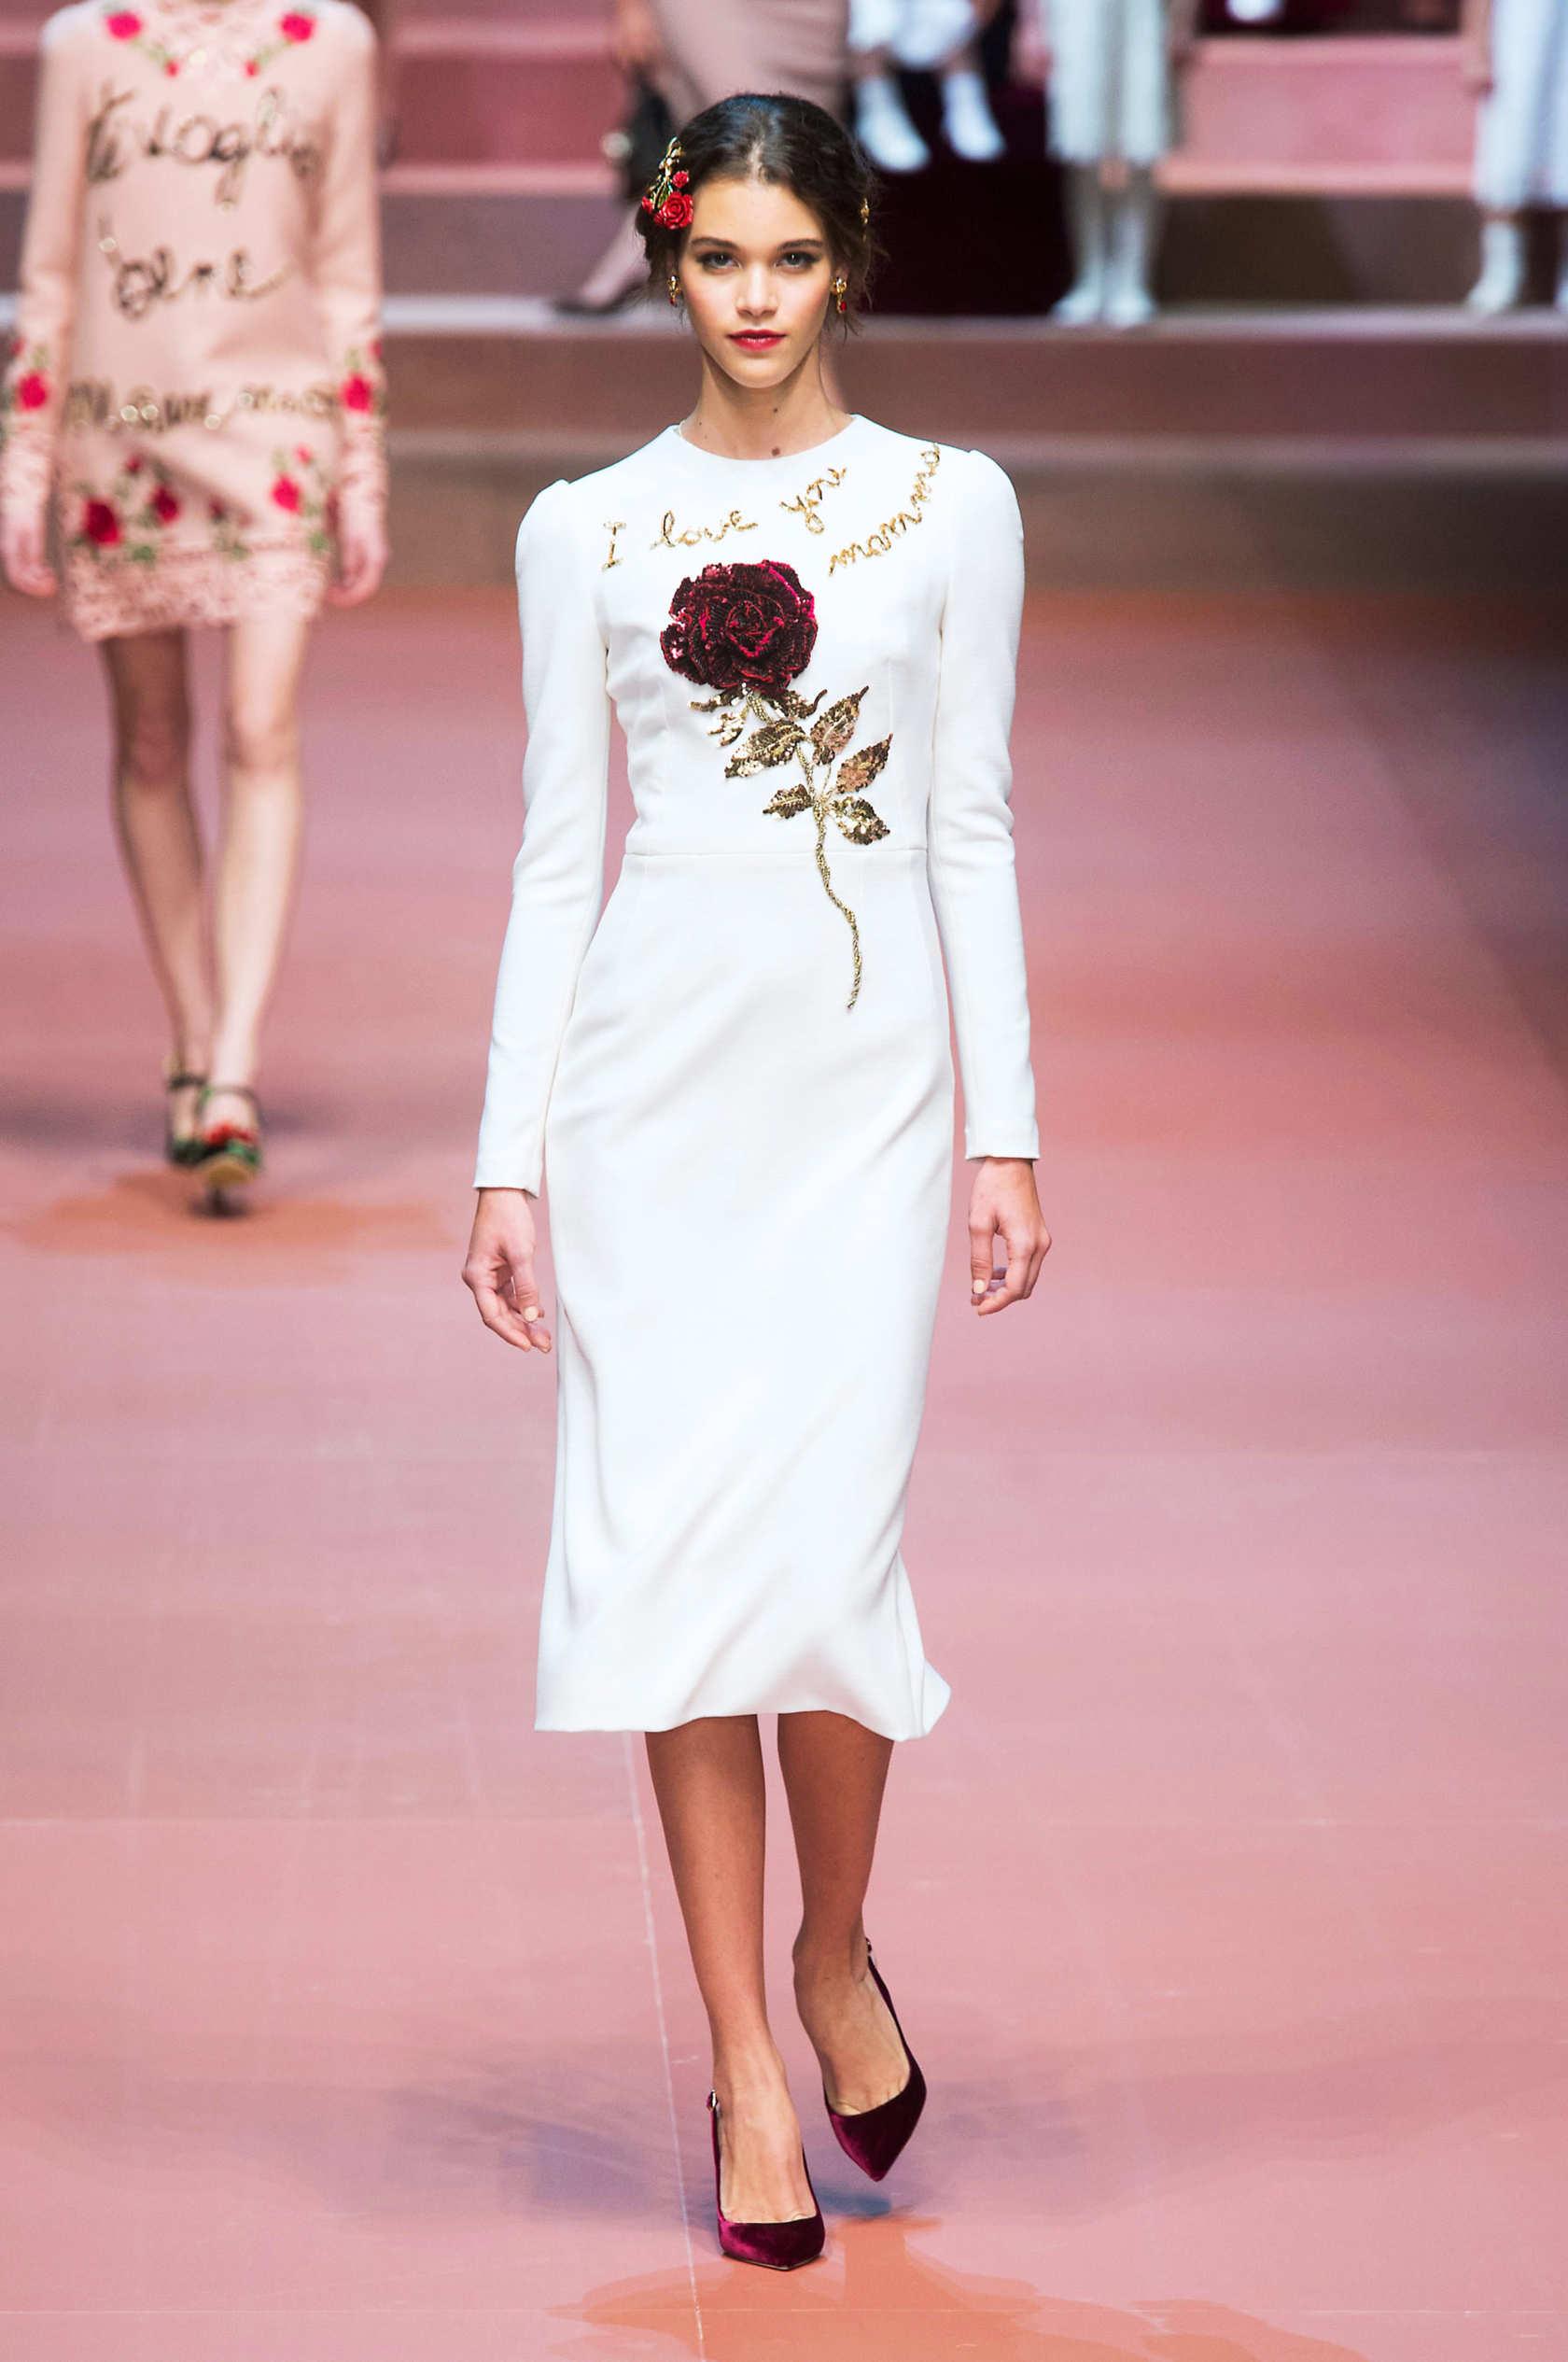 official supplier top brands limited sale Milan Dolce Gabbana 01 – Wild Souls Blog